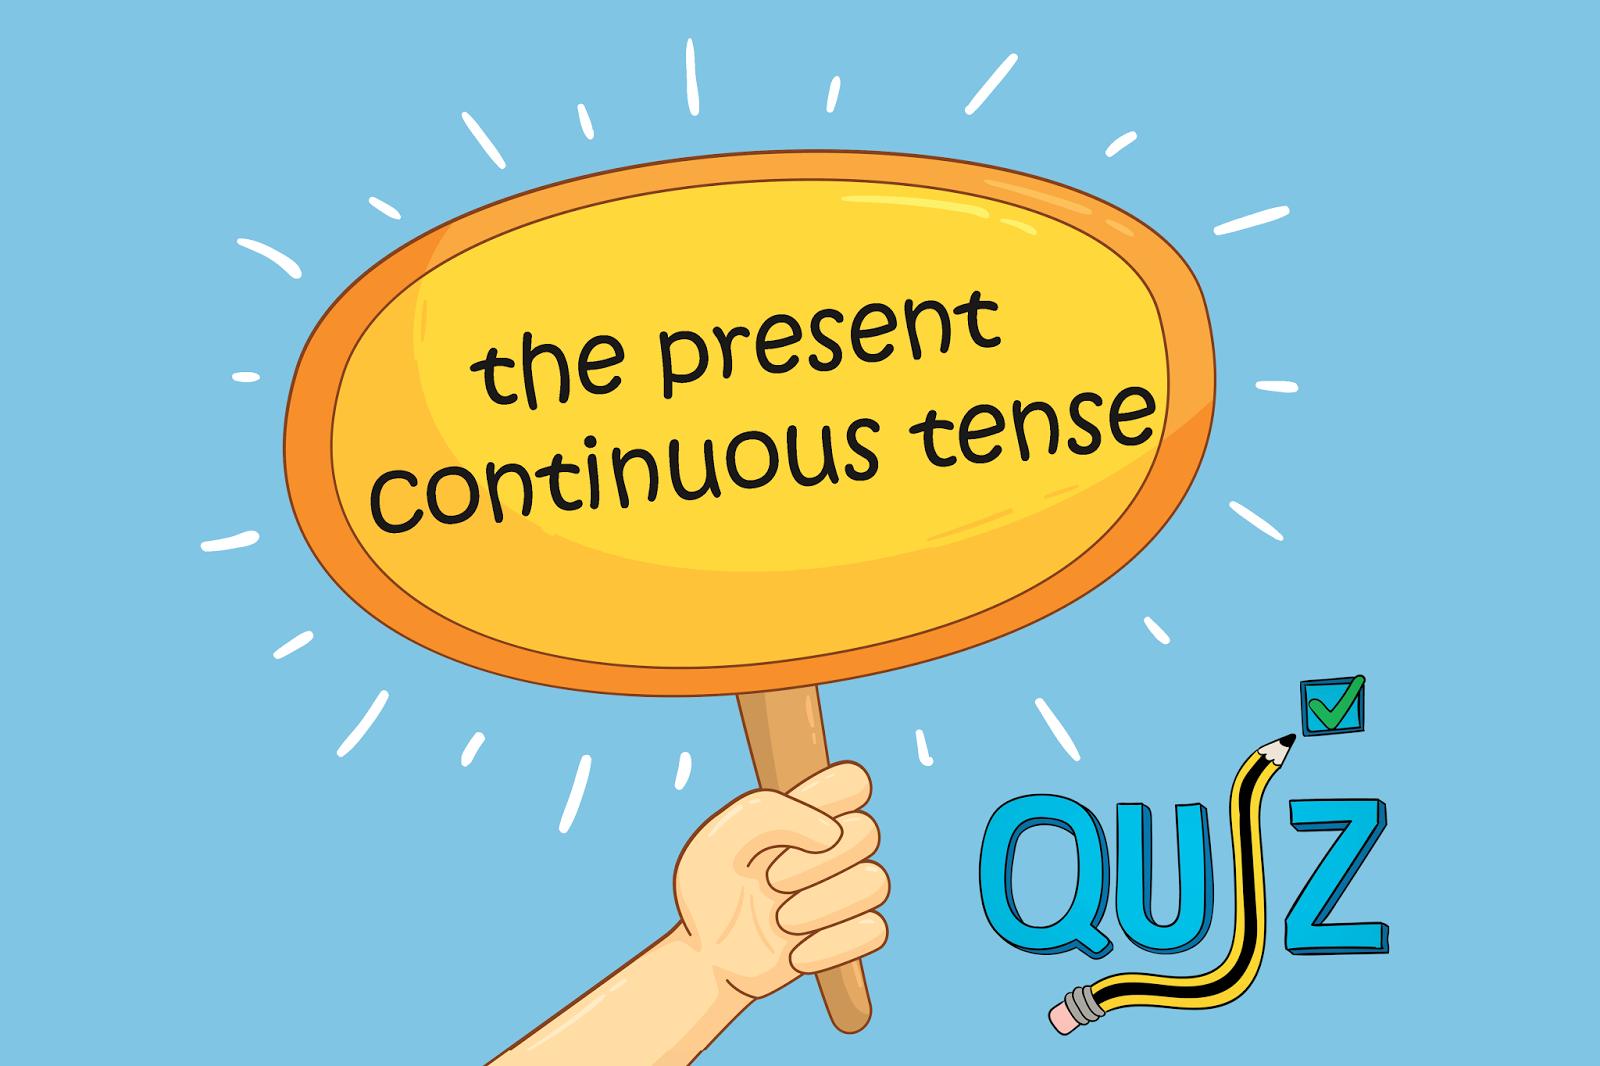 medium resolution of The Present Continuous Tense Multiple Choice Test 7   www.elt-els.com